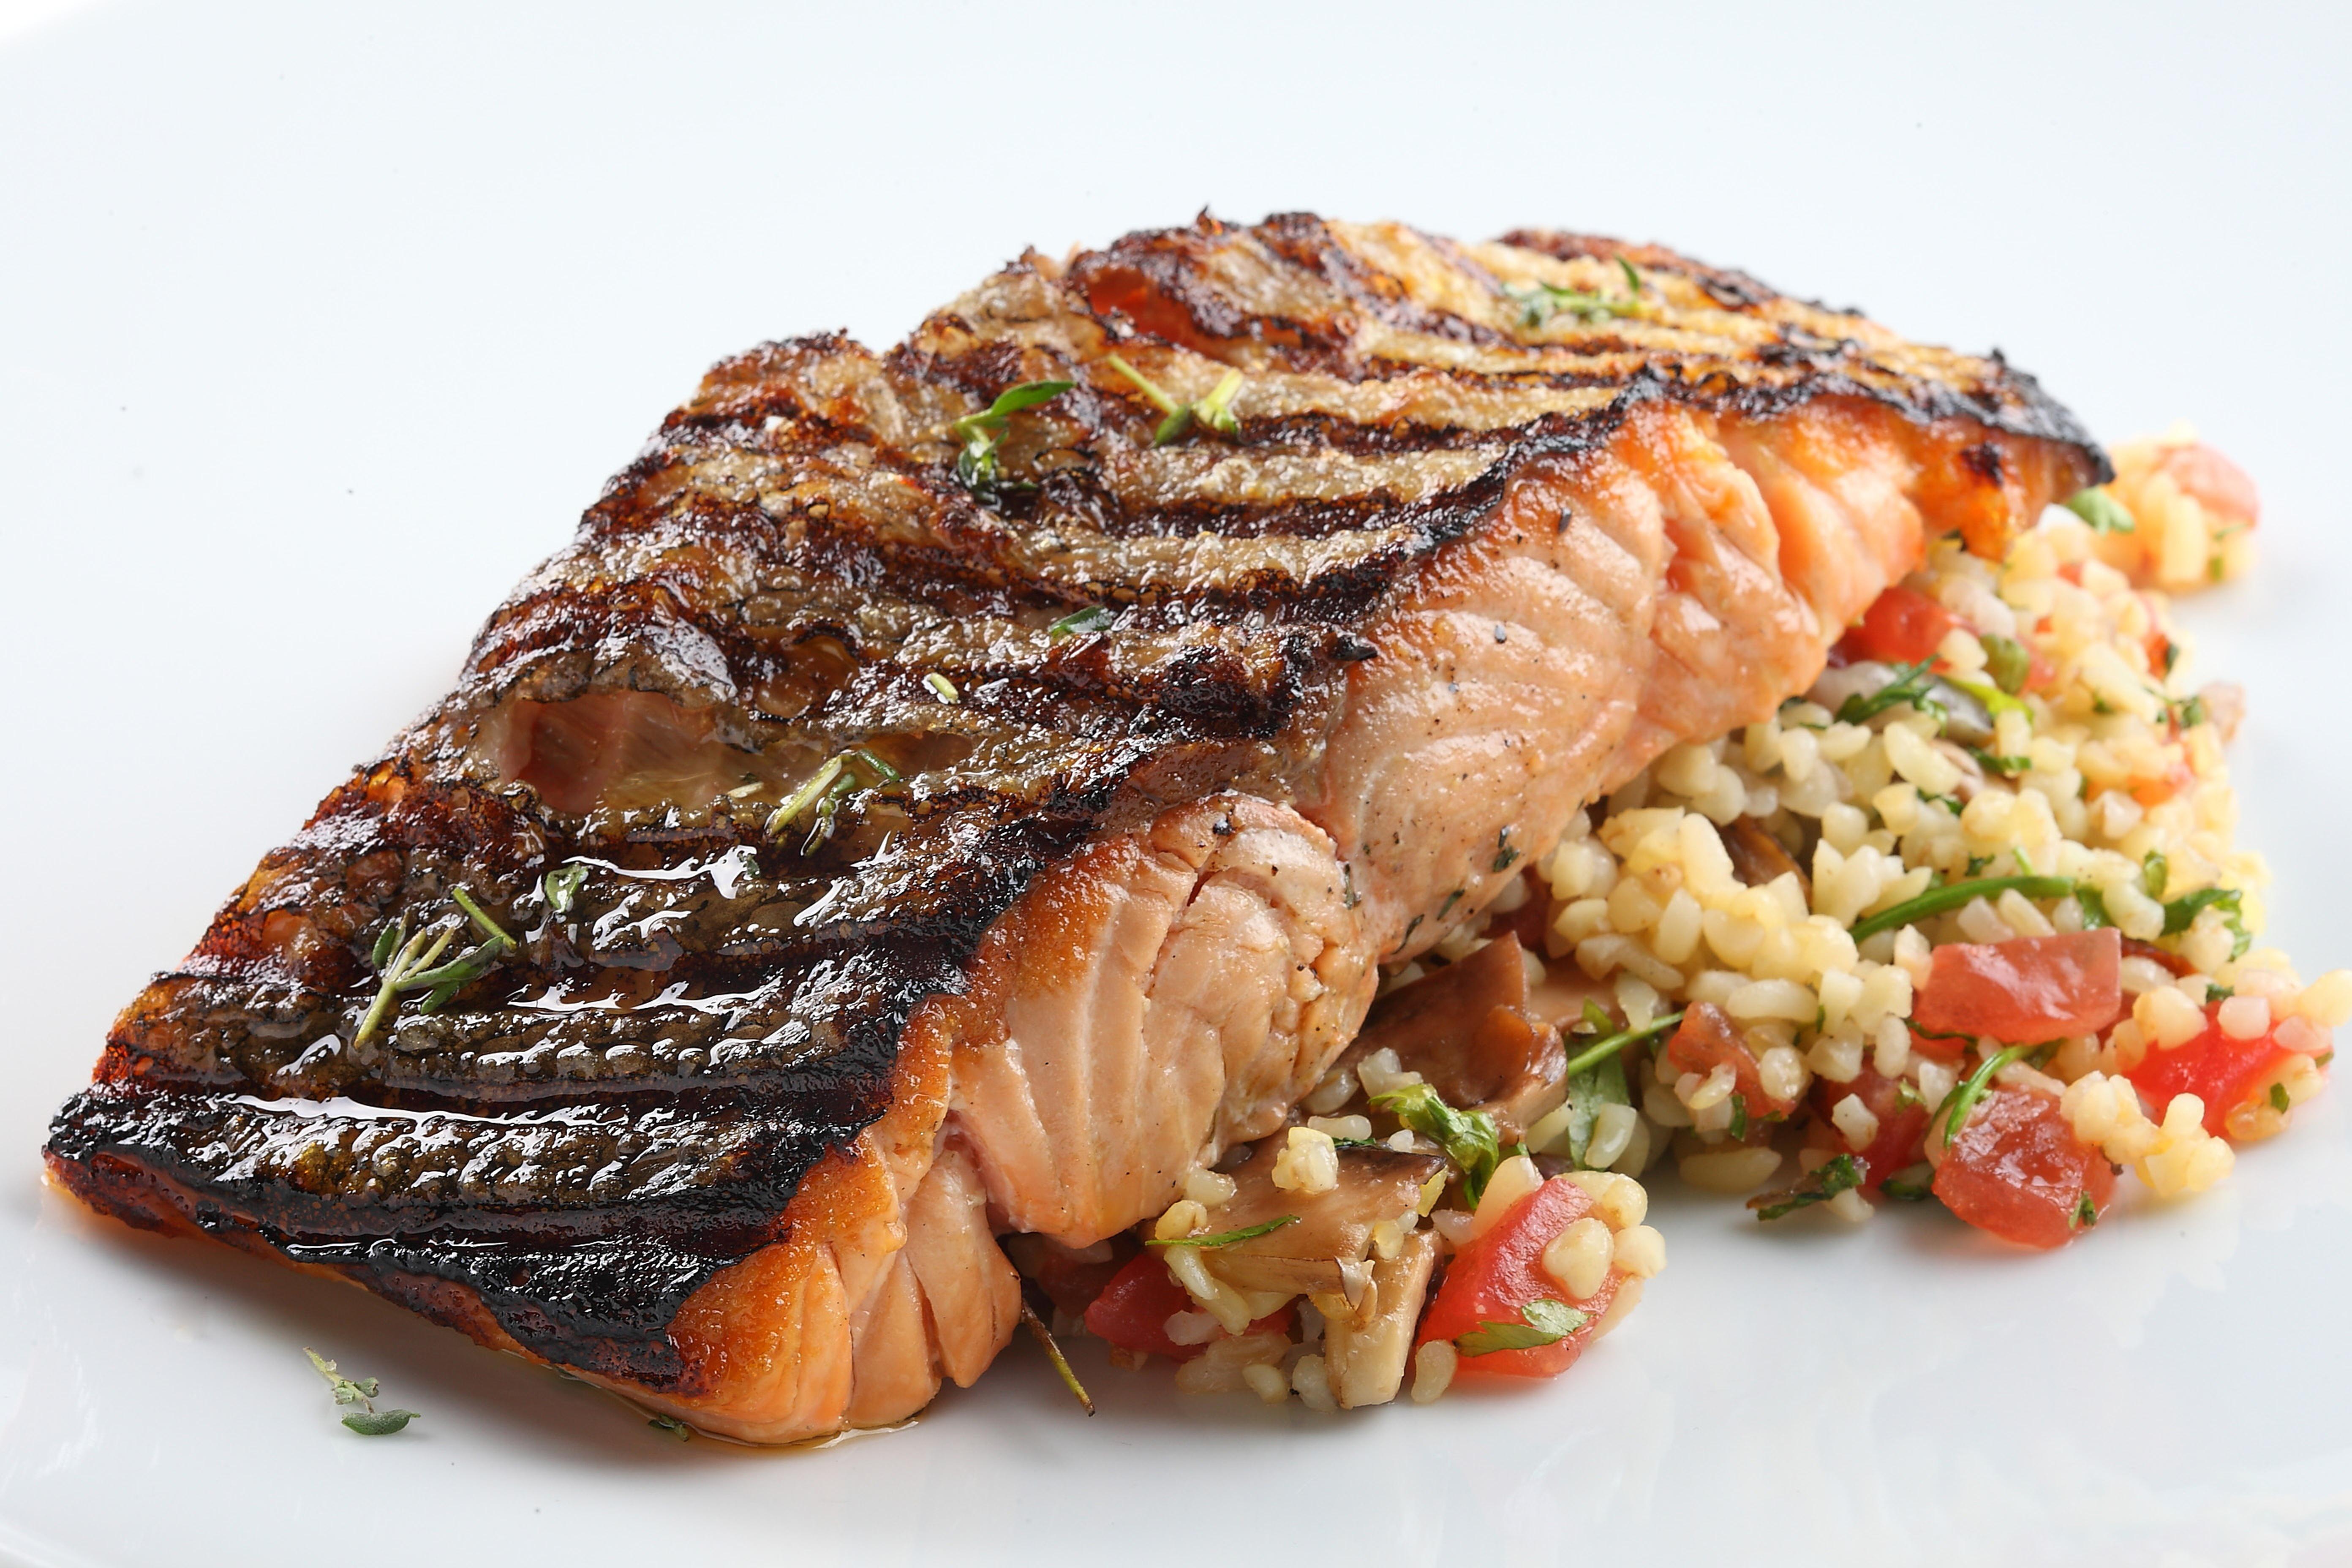 Pan Seared Salmon Passanante S Home Food Service Blog